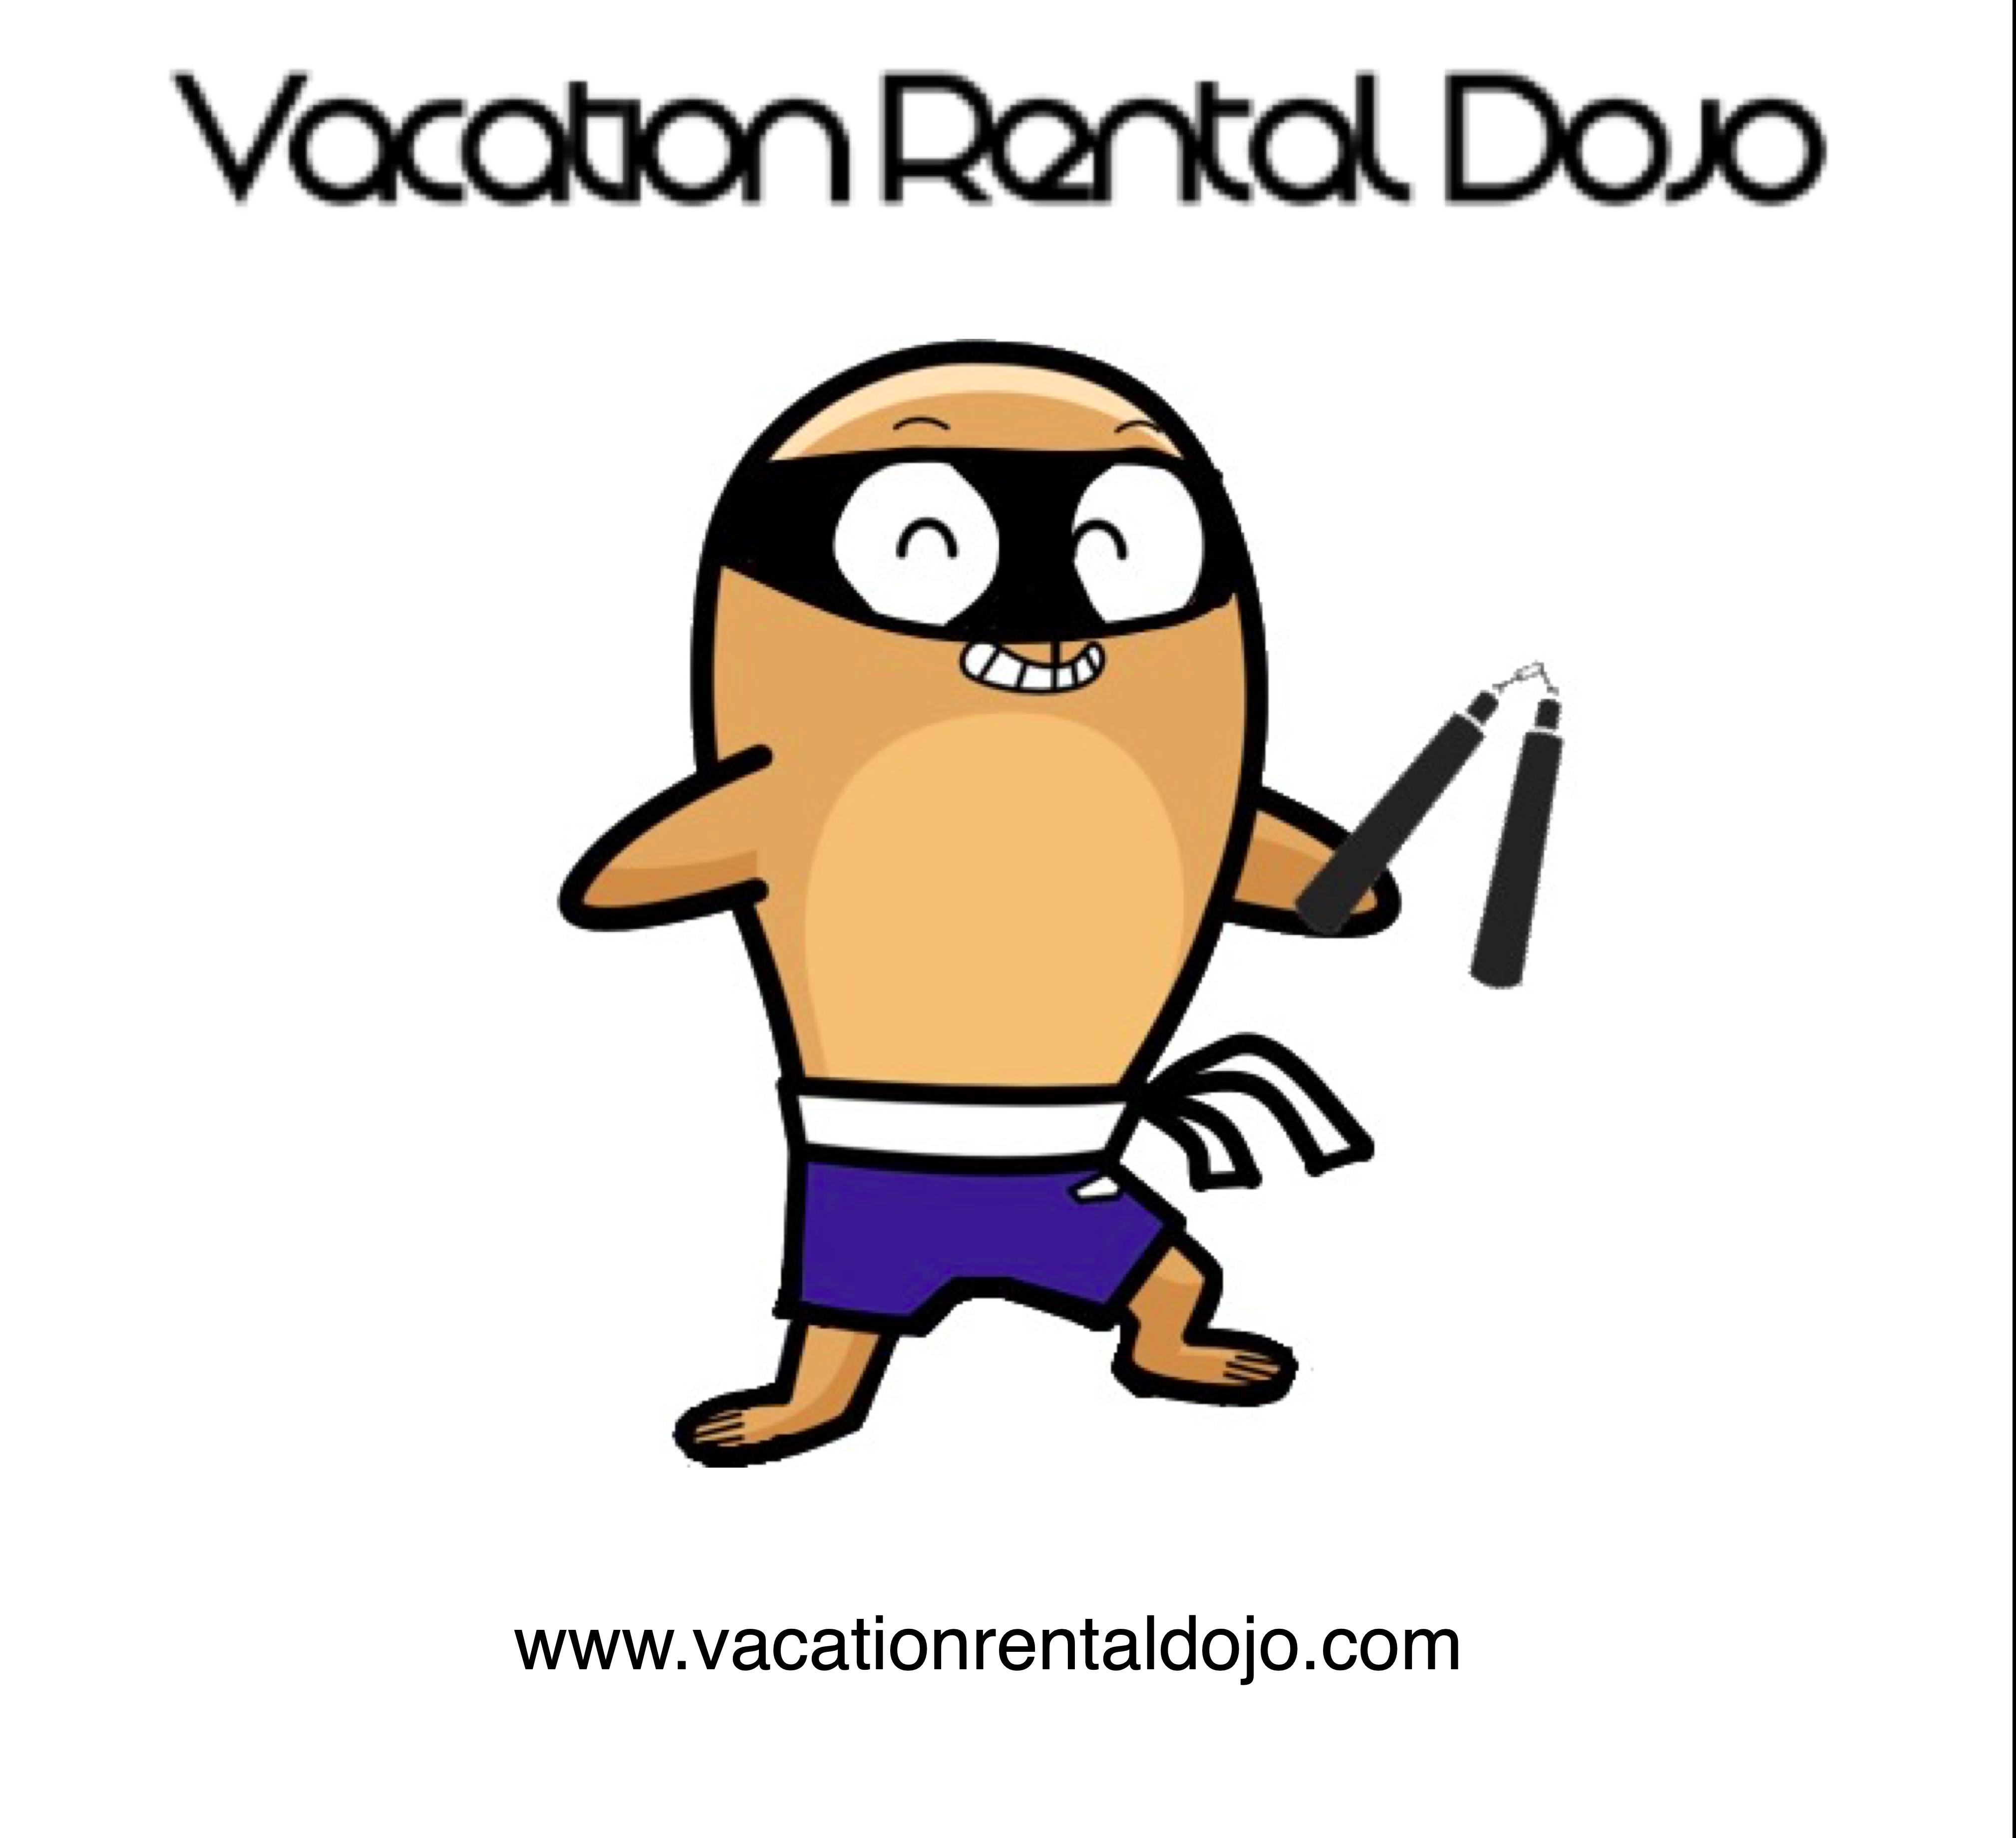 Vacation Rental Dojo Logo